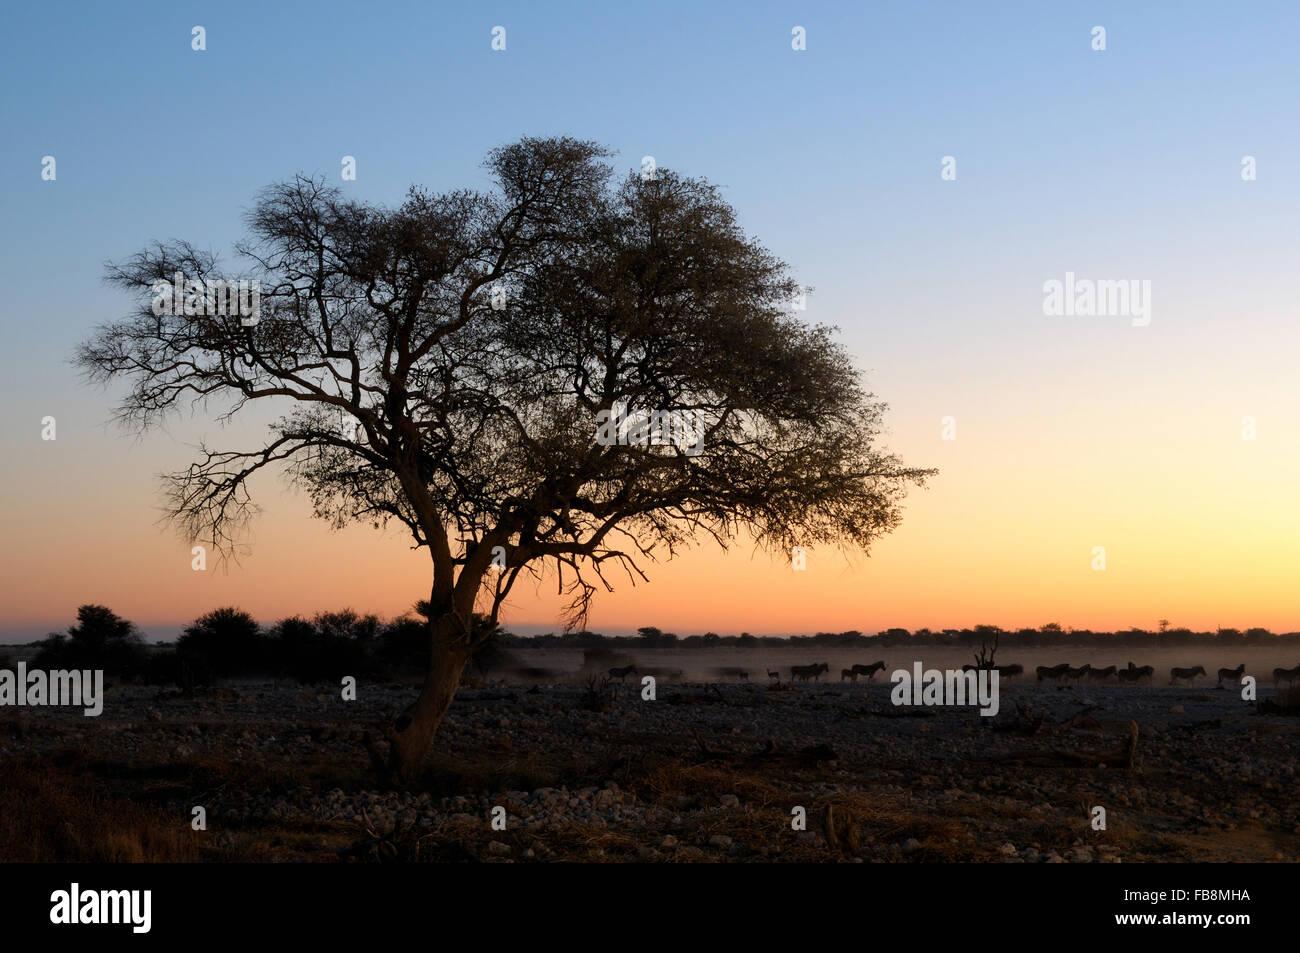 Sunset view of the waterhole, Okaukeujo Rest Camp,  Etosha National Park, Namibia - Stock Image